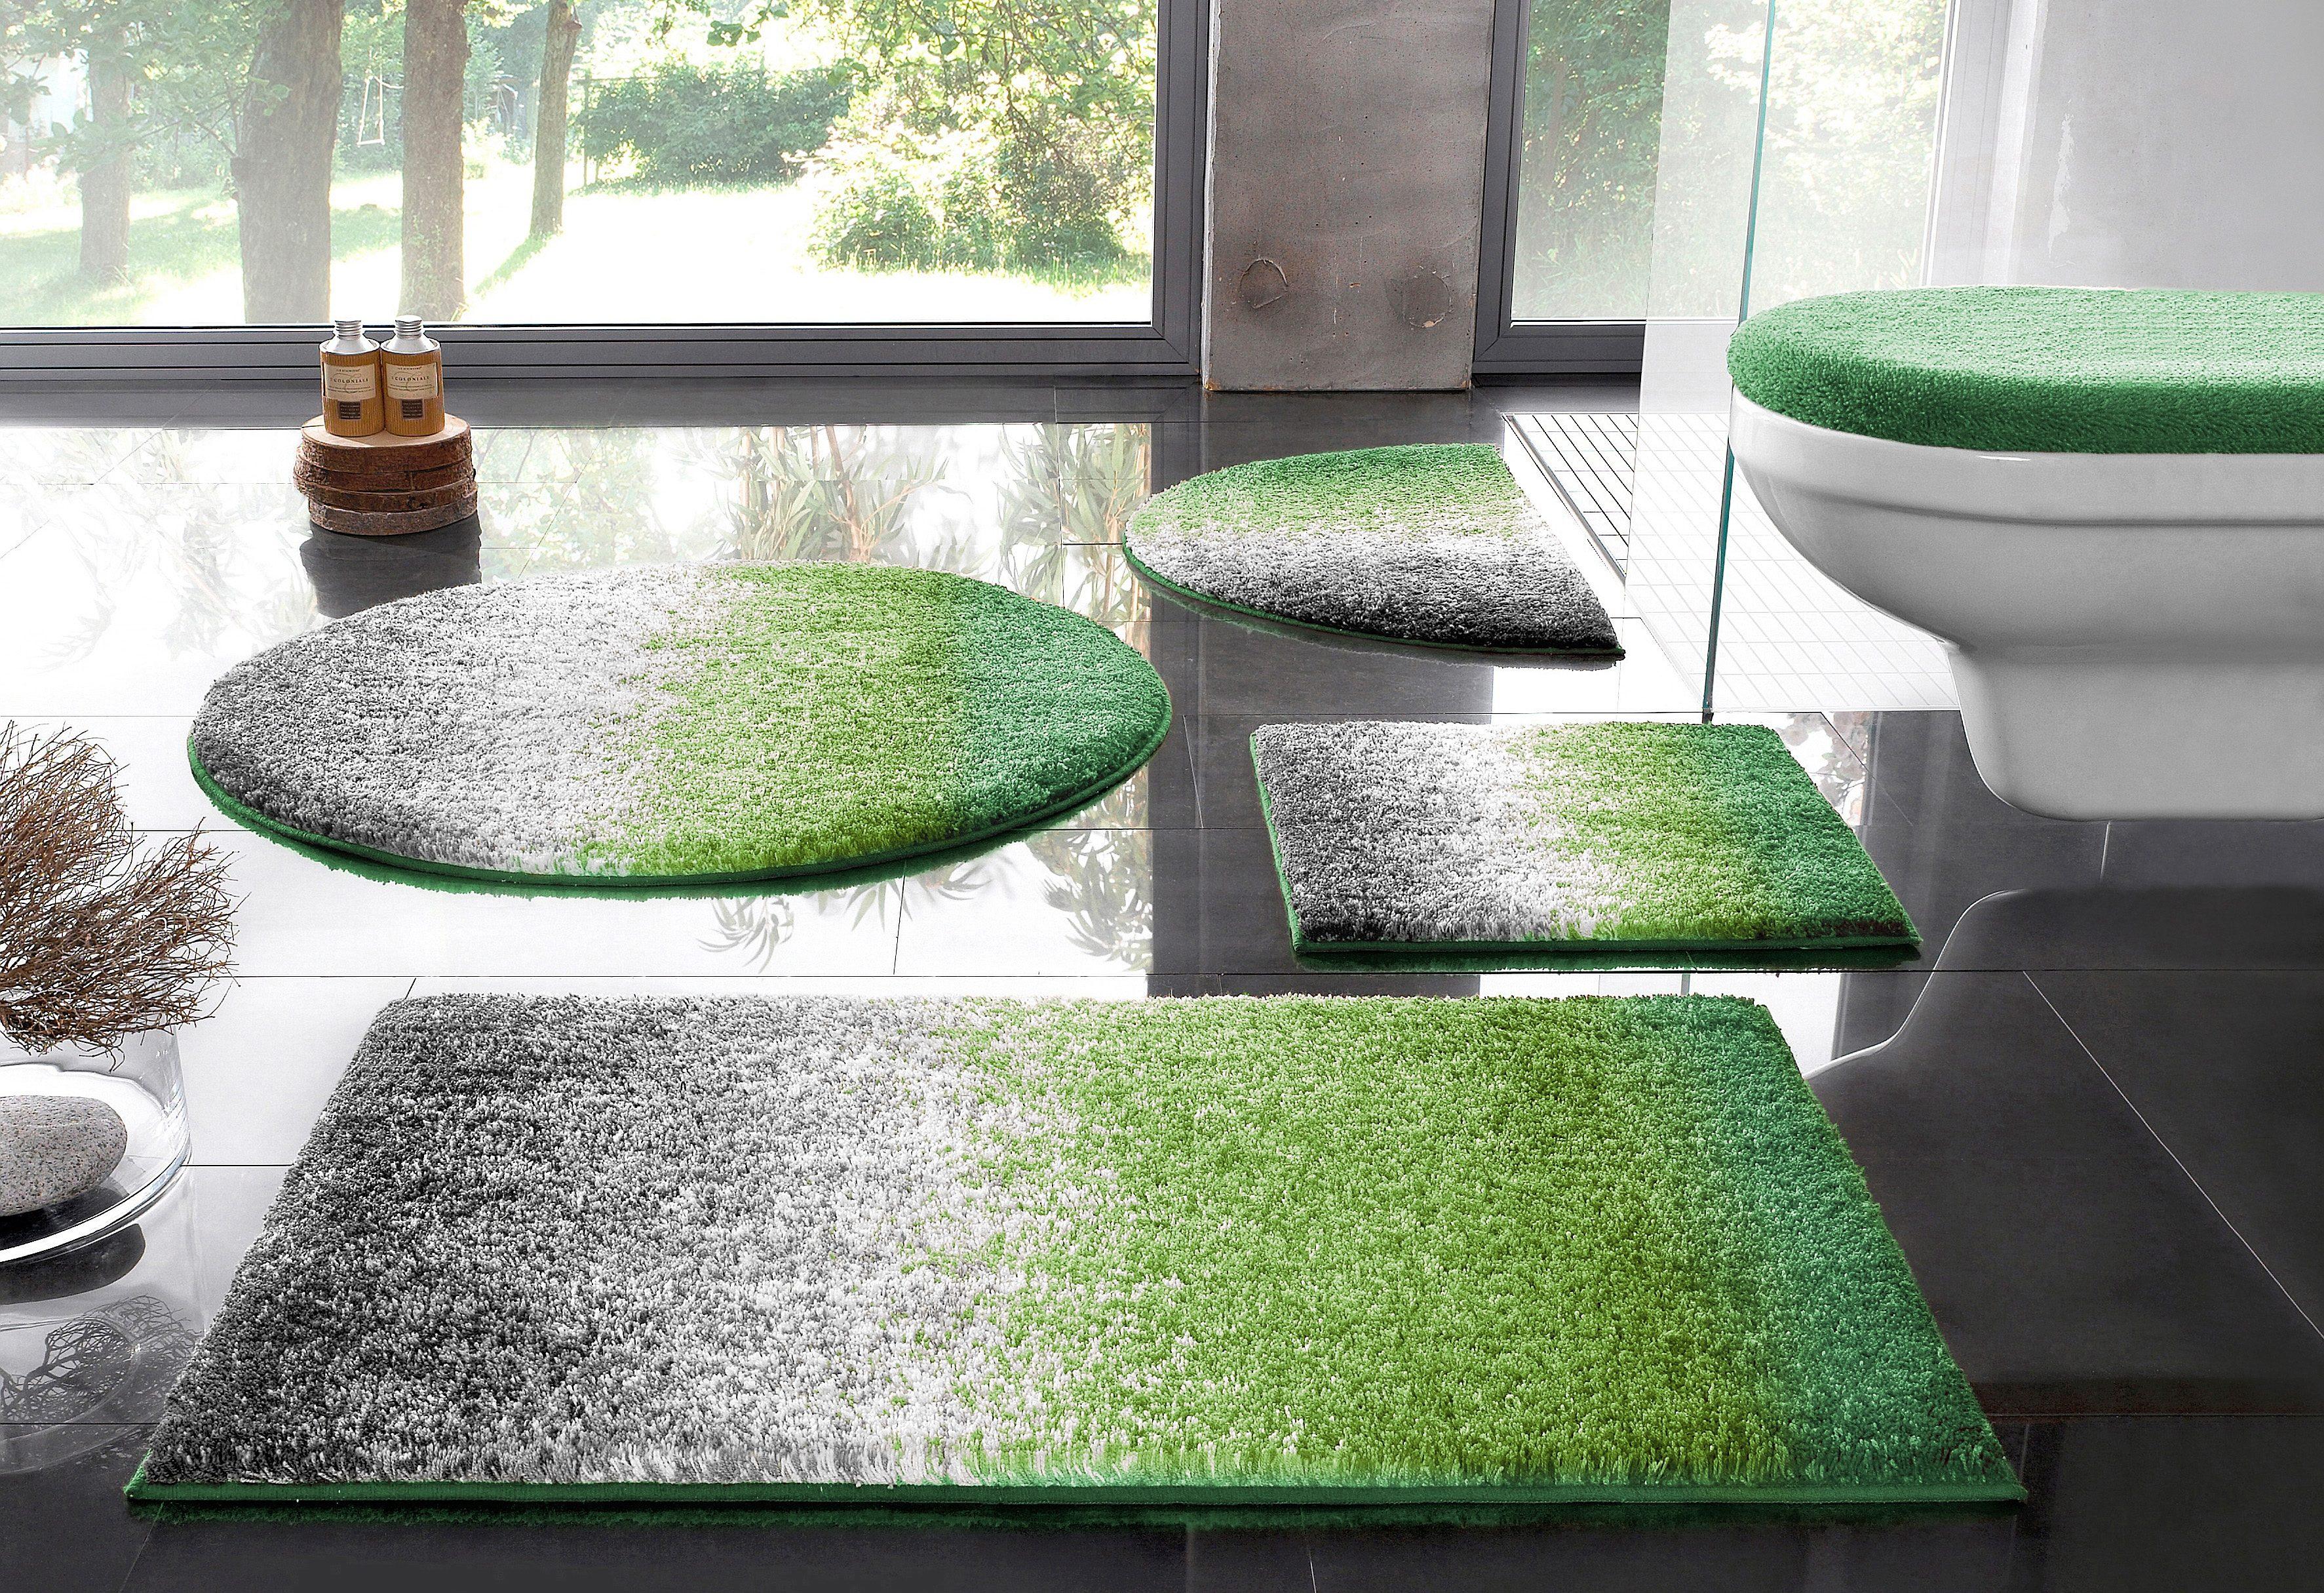 home decor idee n badematten set teilig thehultonbridge. Black Bedroom Furniture Sets. Home Design Ideas